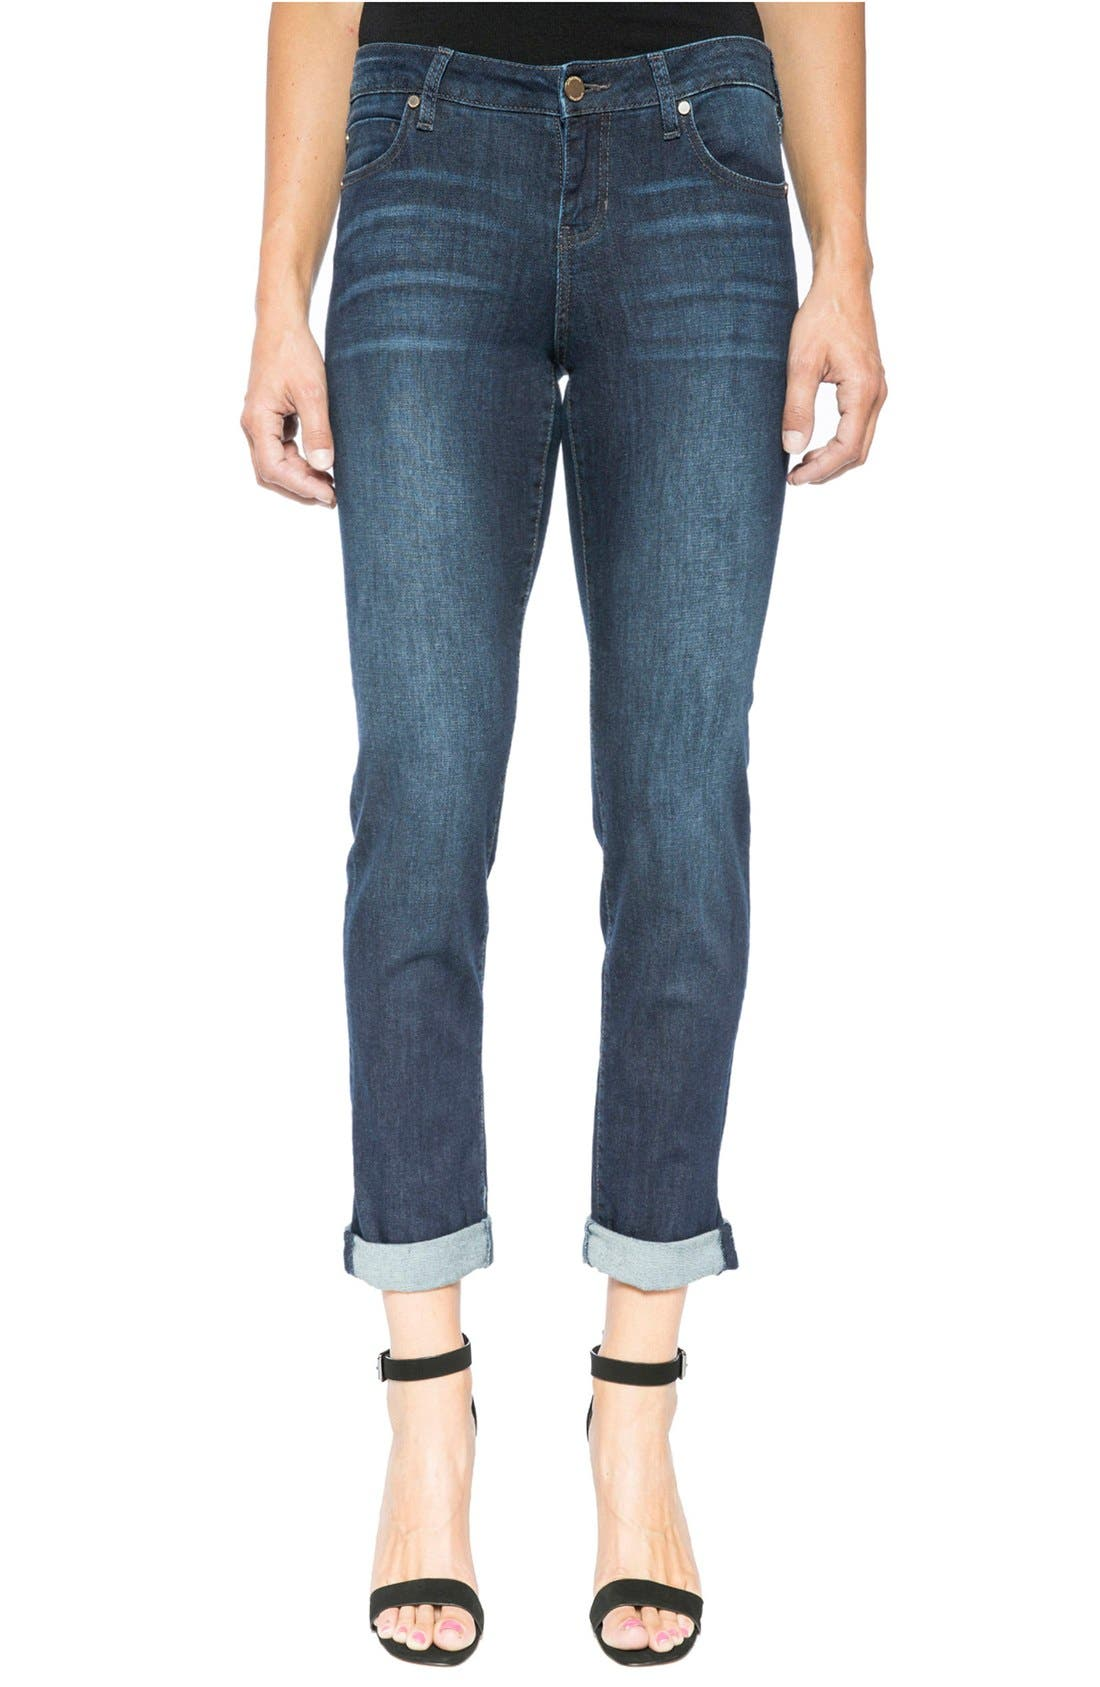 Liverpool Jeans Company Peyton Slim Stretch Crop Boyfriend Jeans (Vintage Super Dark) (Regular & Petite)